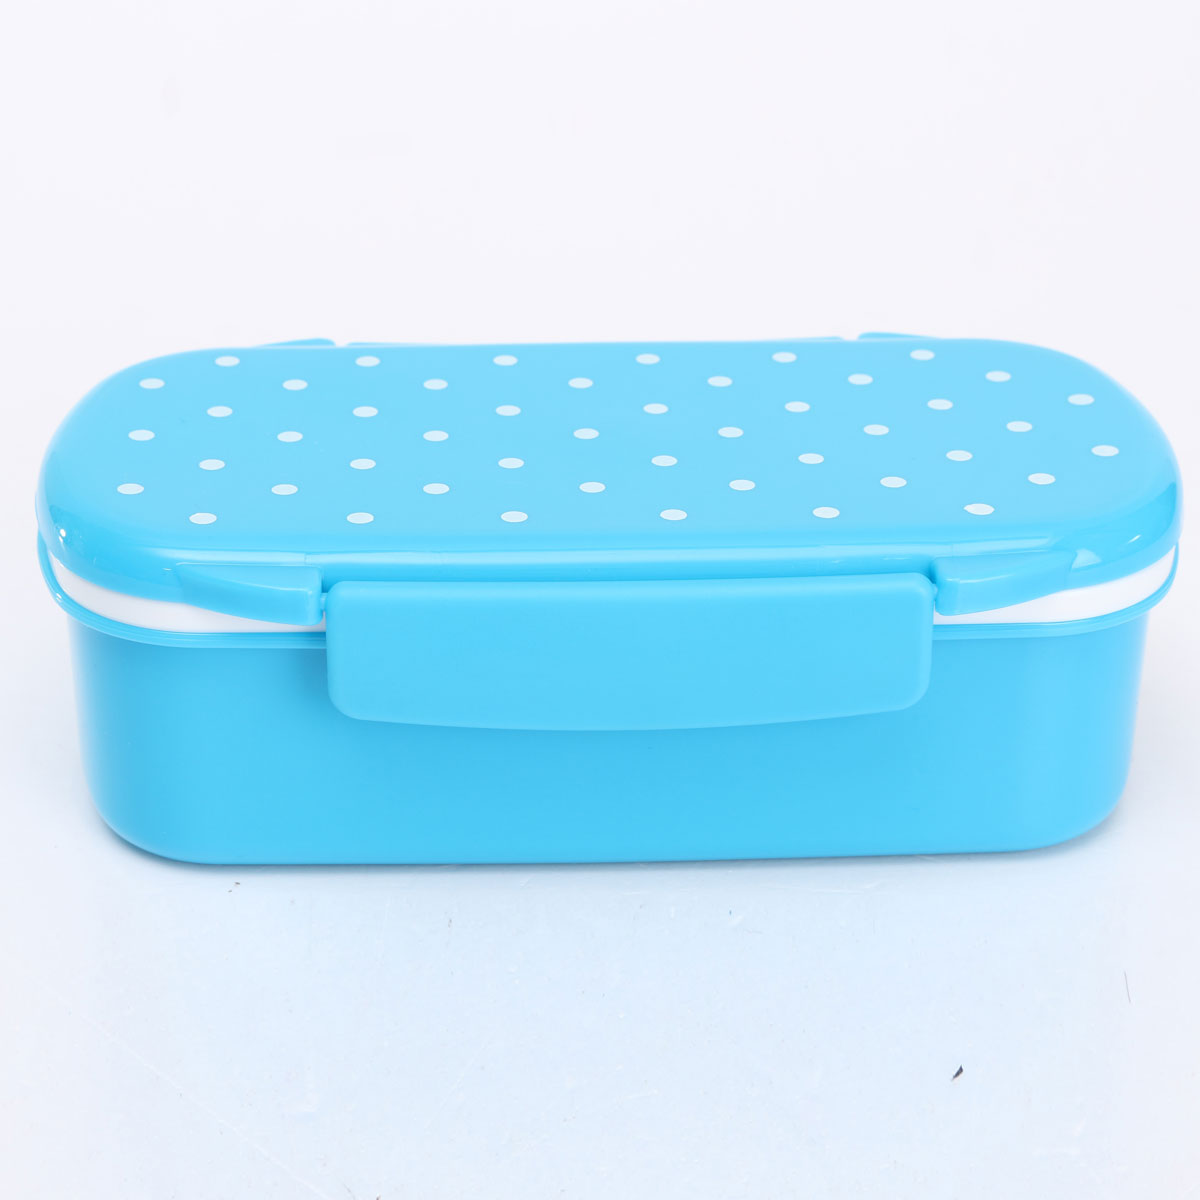 cute plastic lunch box food container storage box portable bento box spoon fork ebay. Black Bedroom Furniture Sets. Home Design Ideas